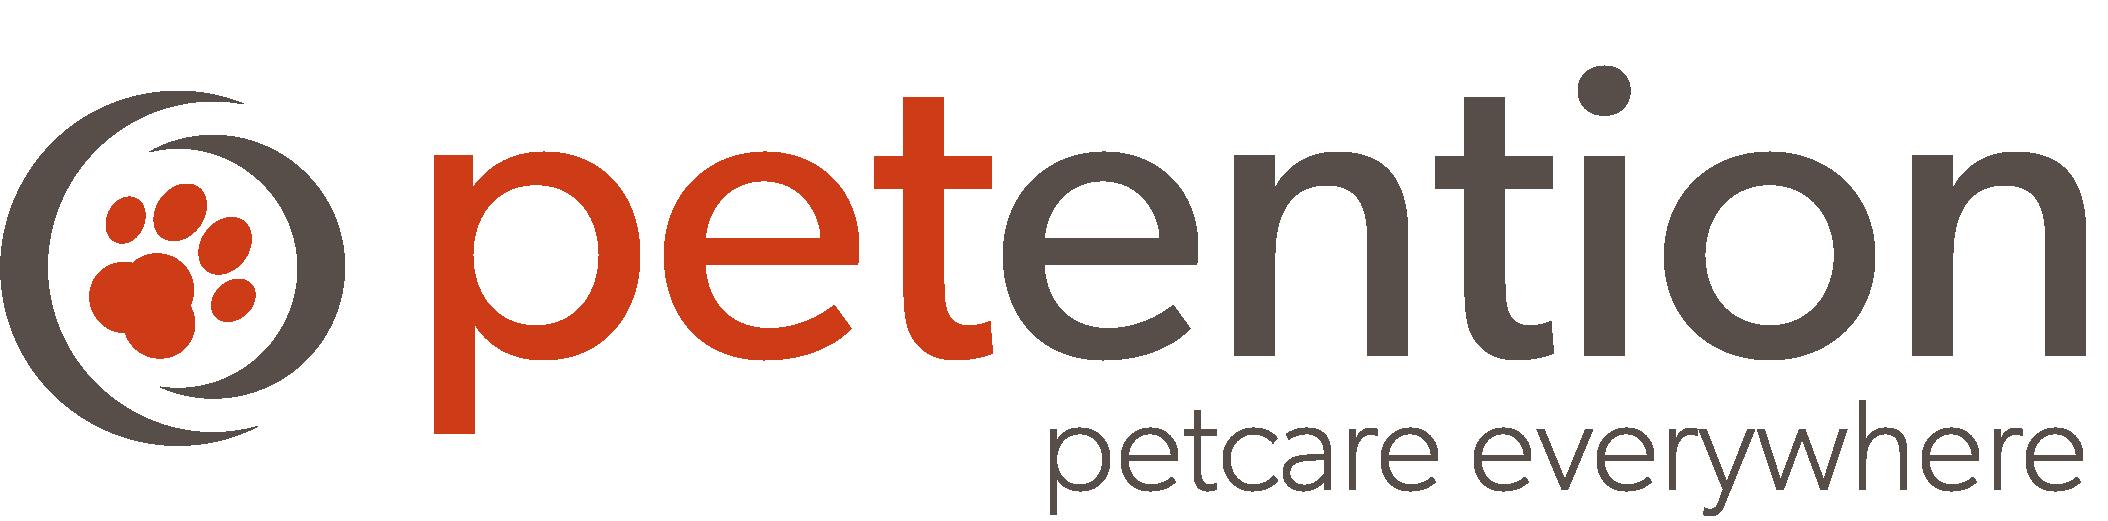 Petention_logo_FINAL